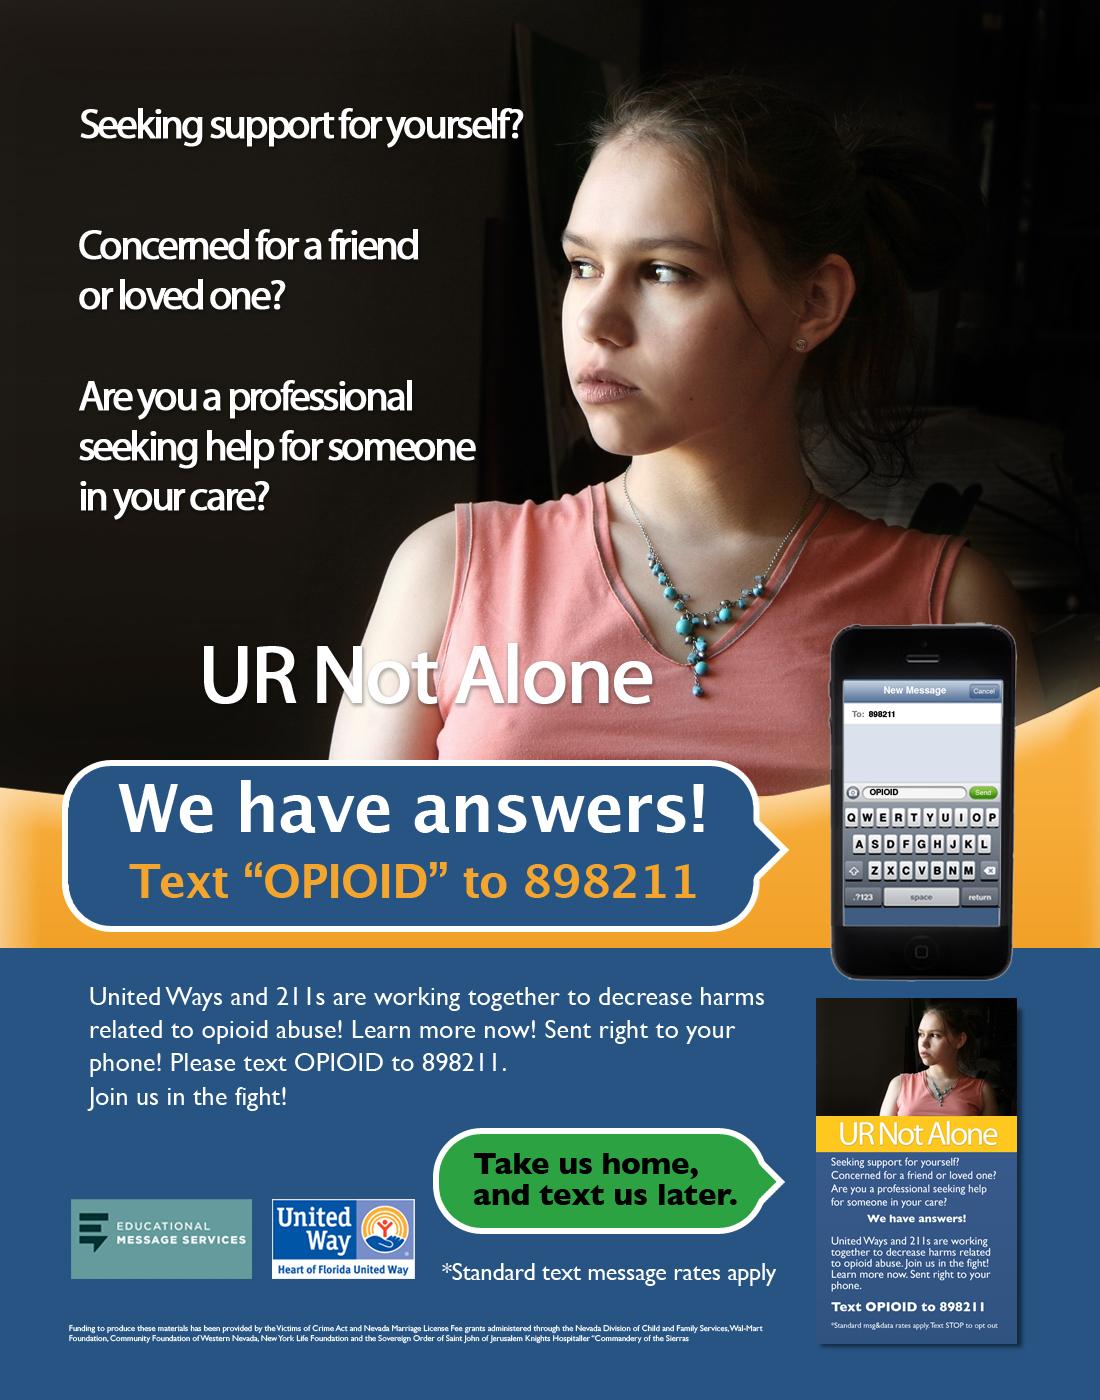 opioids_girl_poster5.jpg